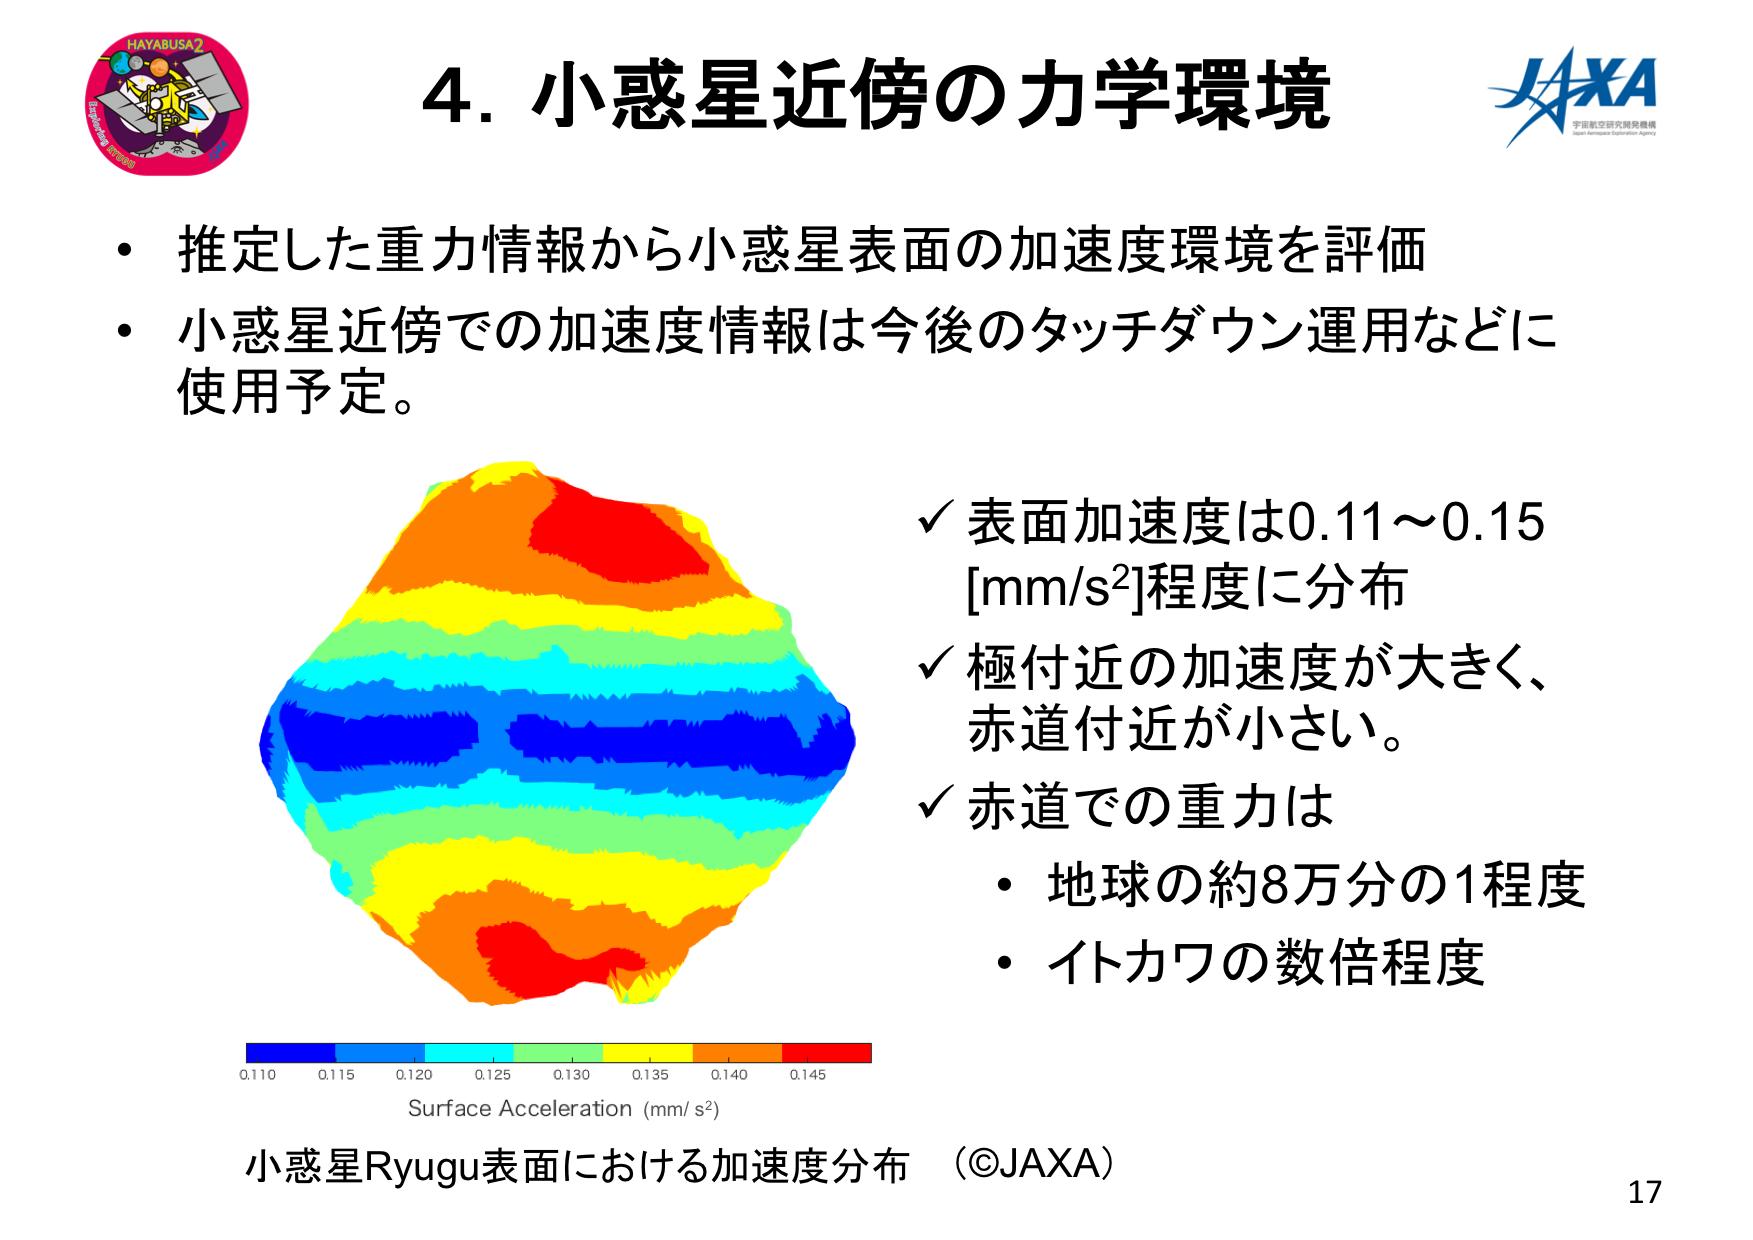 f:id:Imamura:20180905231949p:plain